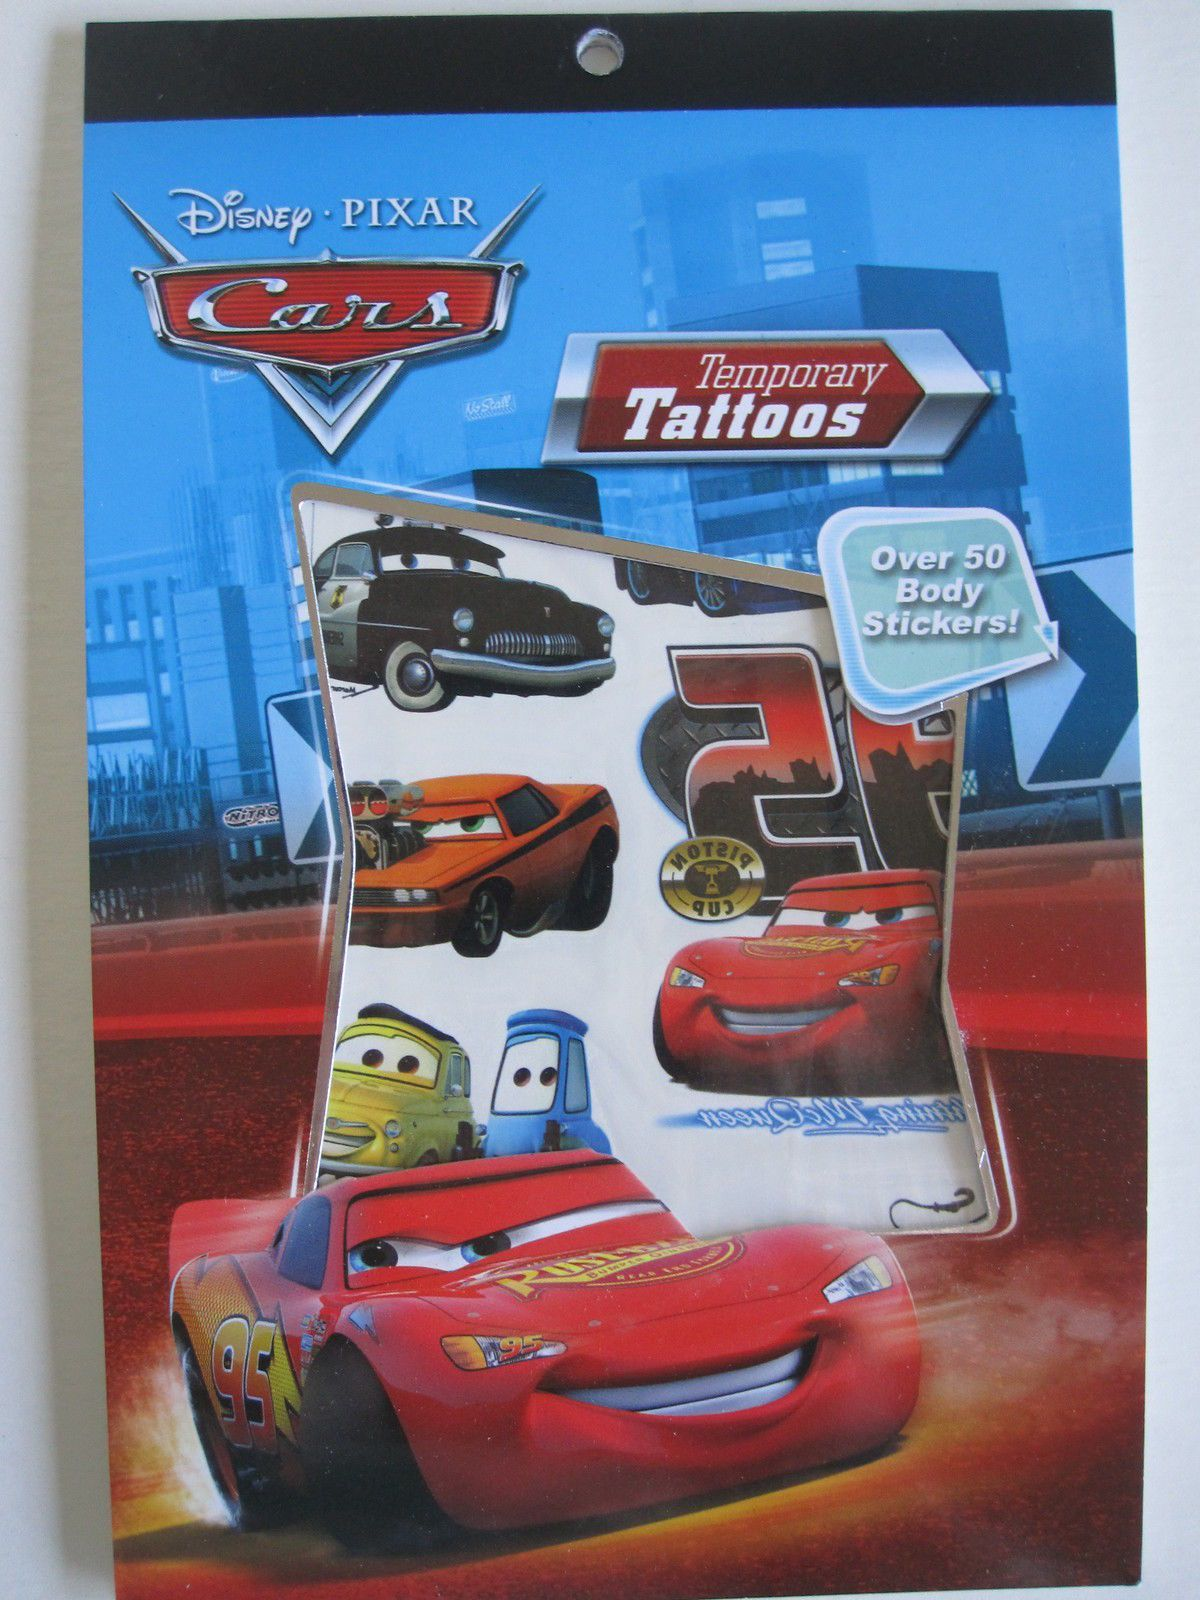 Disneys Cars Temporary Tattoo Book Party Accessory by Disney